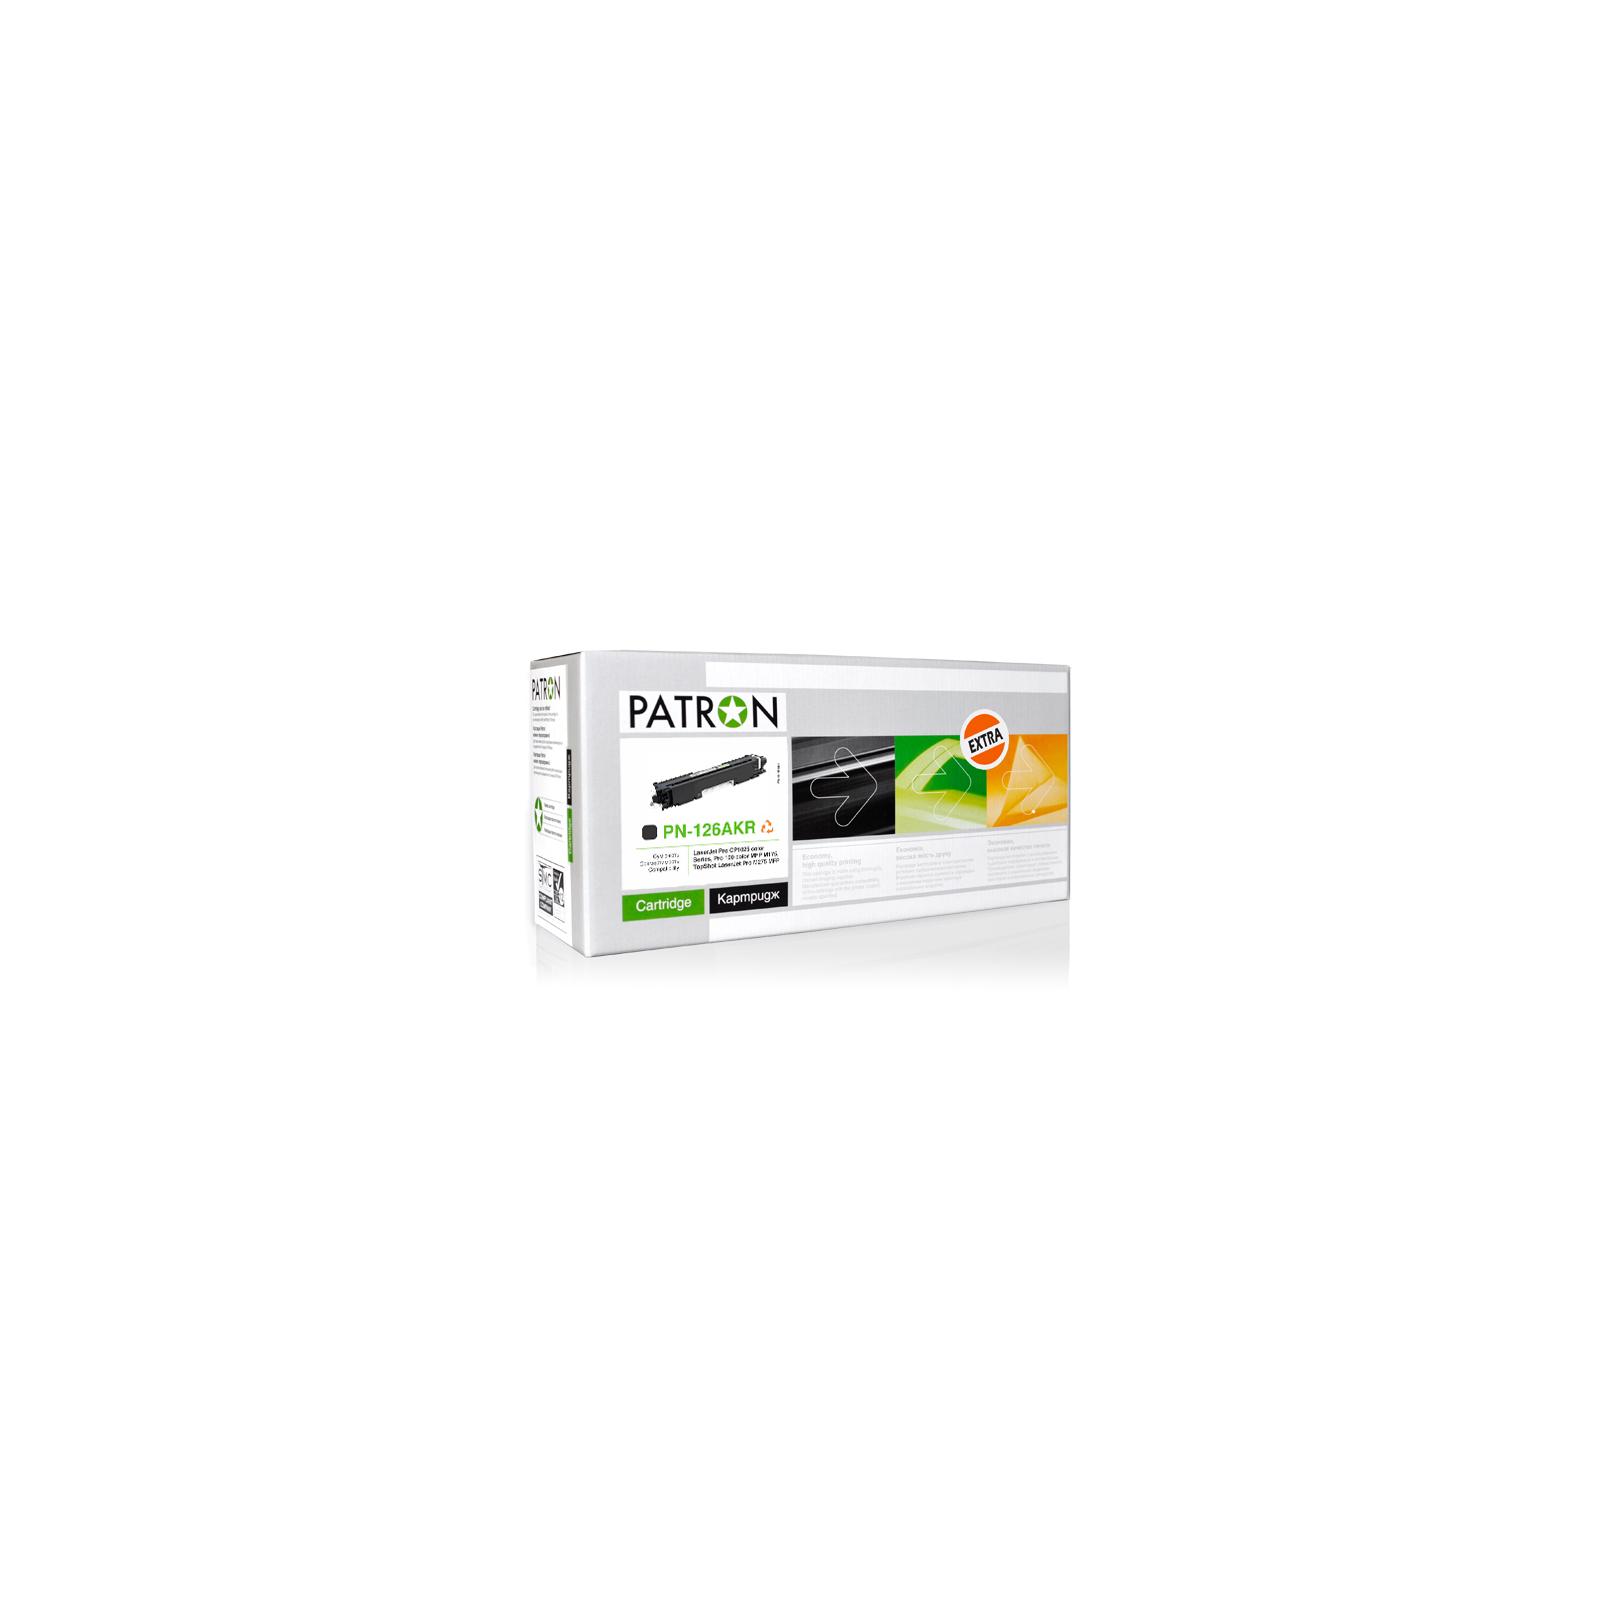 Картридж PATRON HP CLJ P1025/ CE310A (PN-126AKR) BLACK Extra (CT-HP-CE310A-B-PN-R)